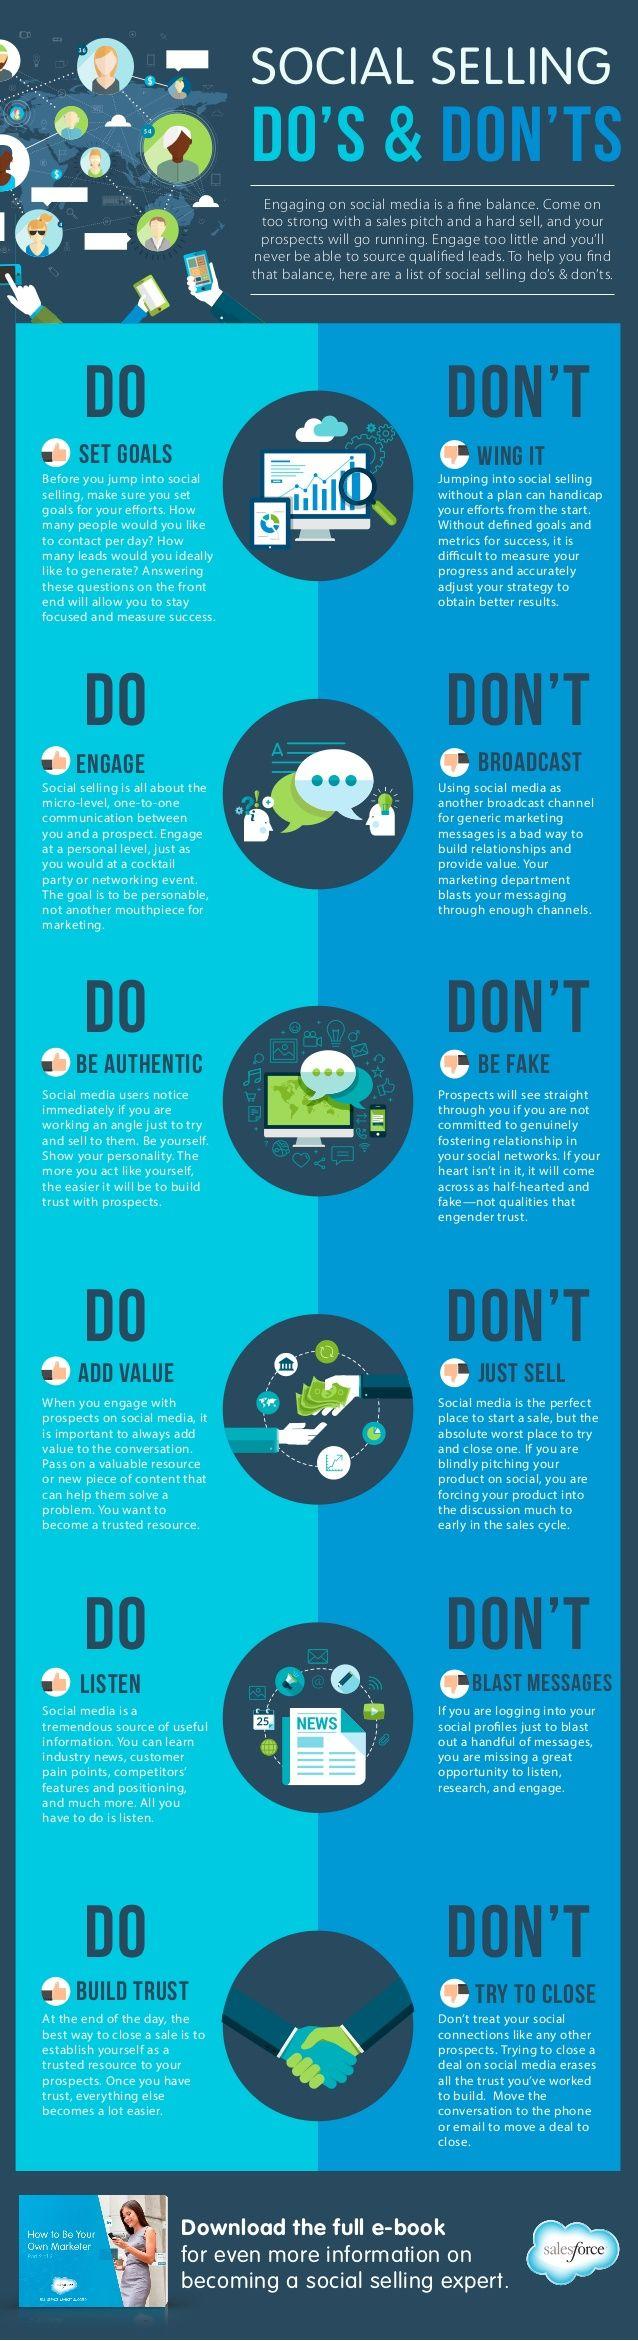 Infographic: Do's & Don'ts of Social Selling by Salesforce via slideshare. #socialmedia